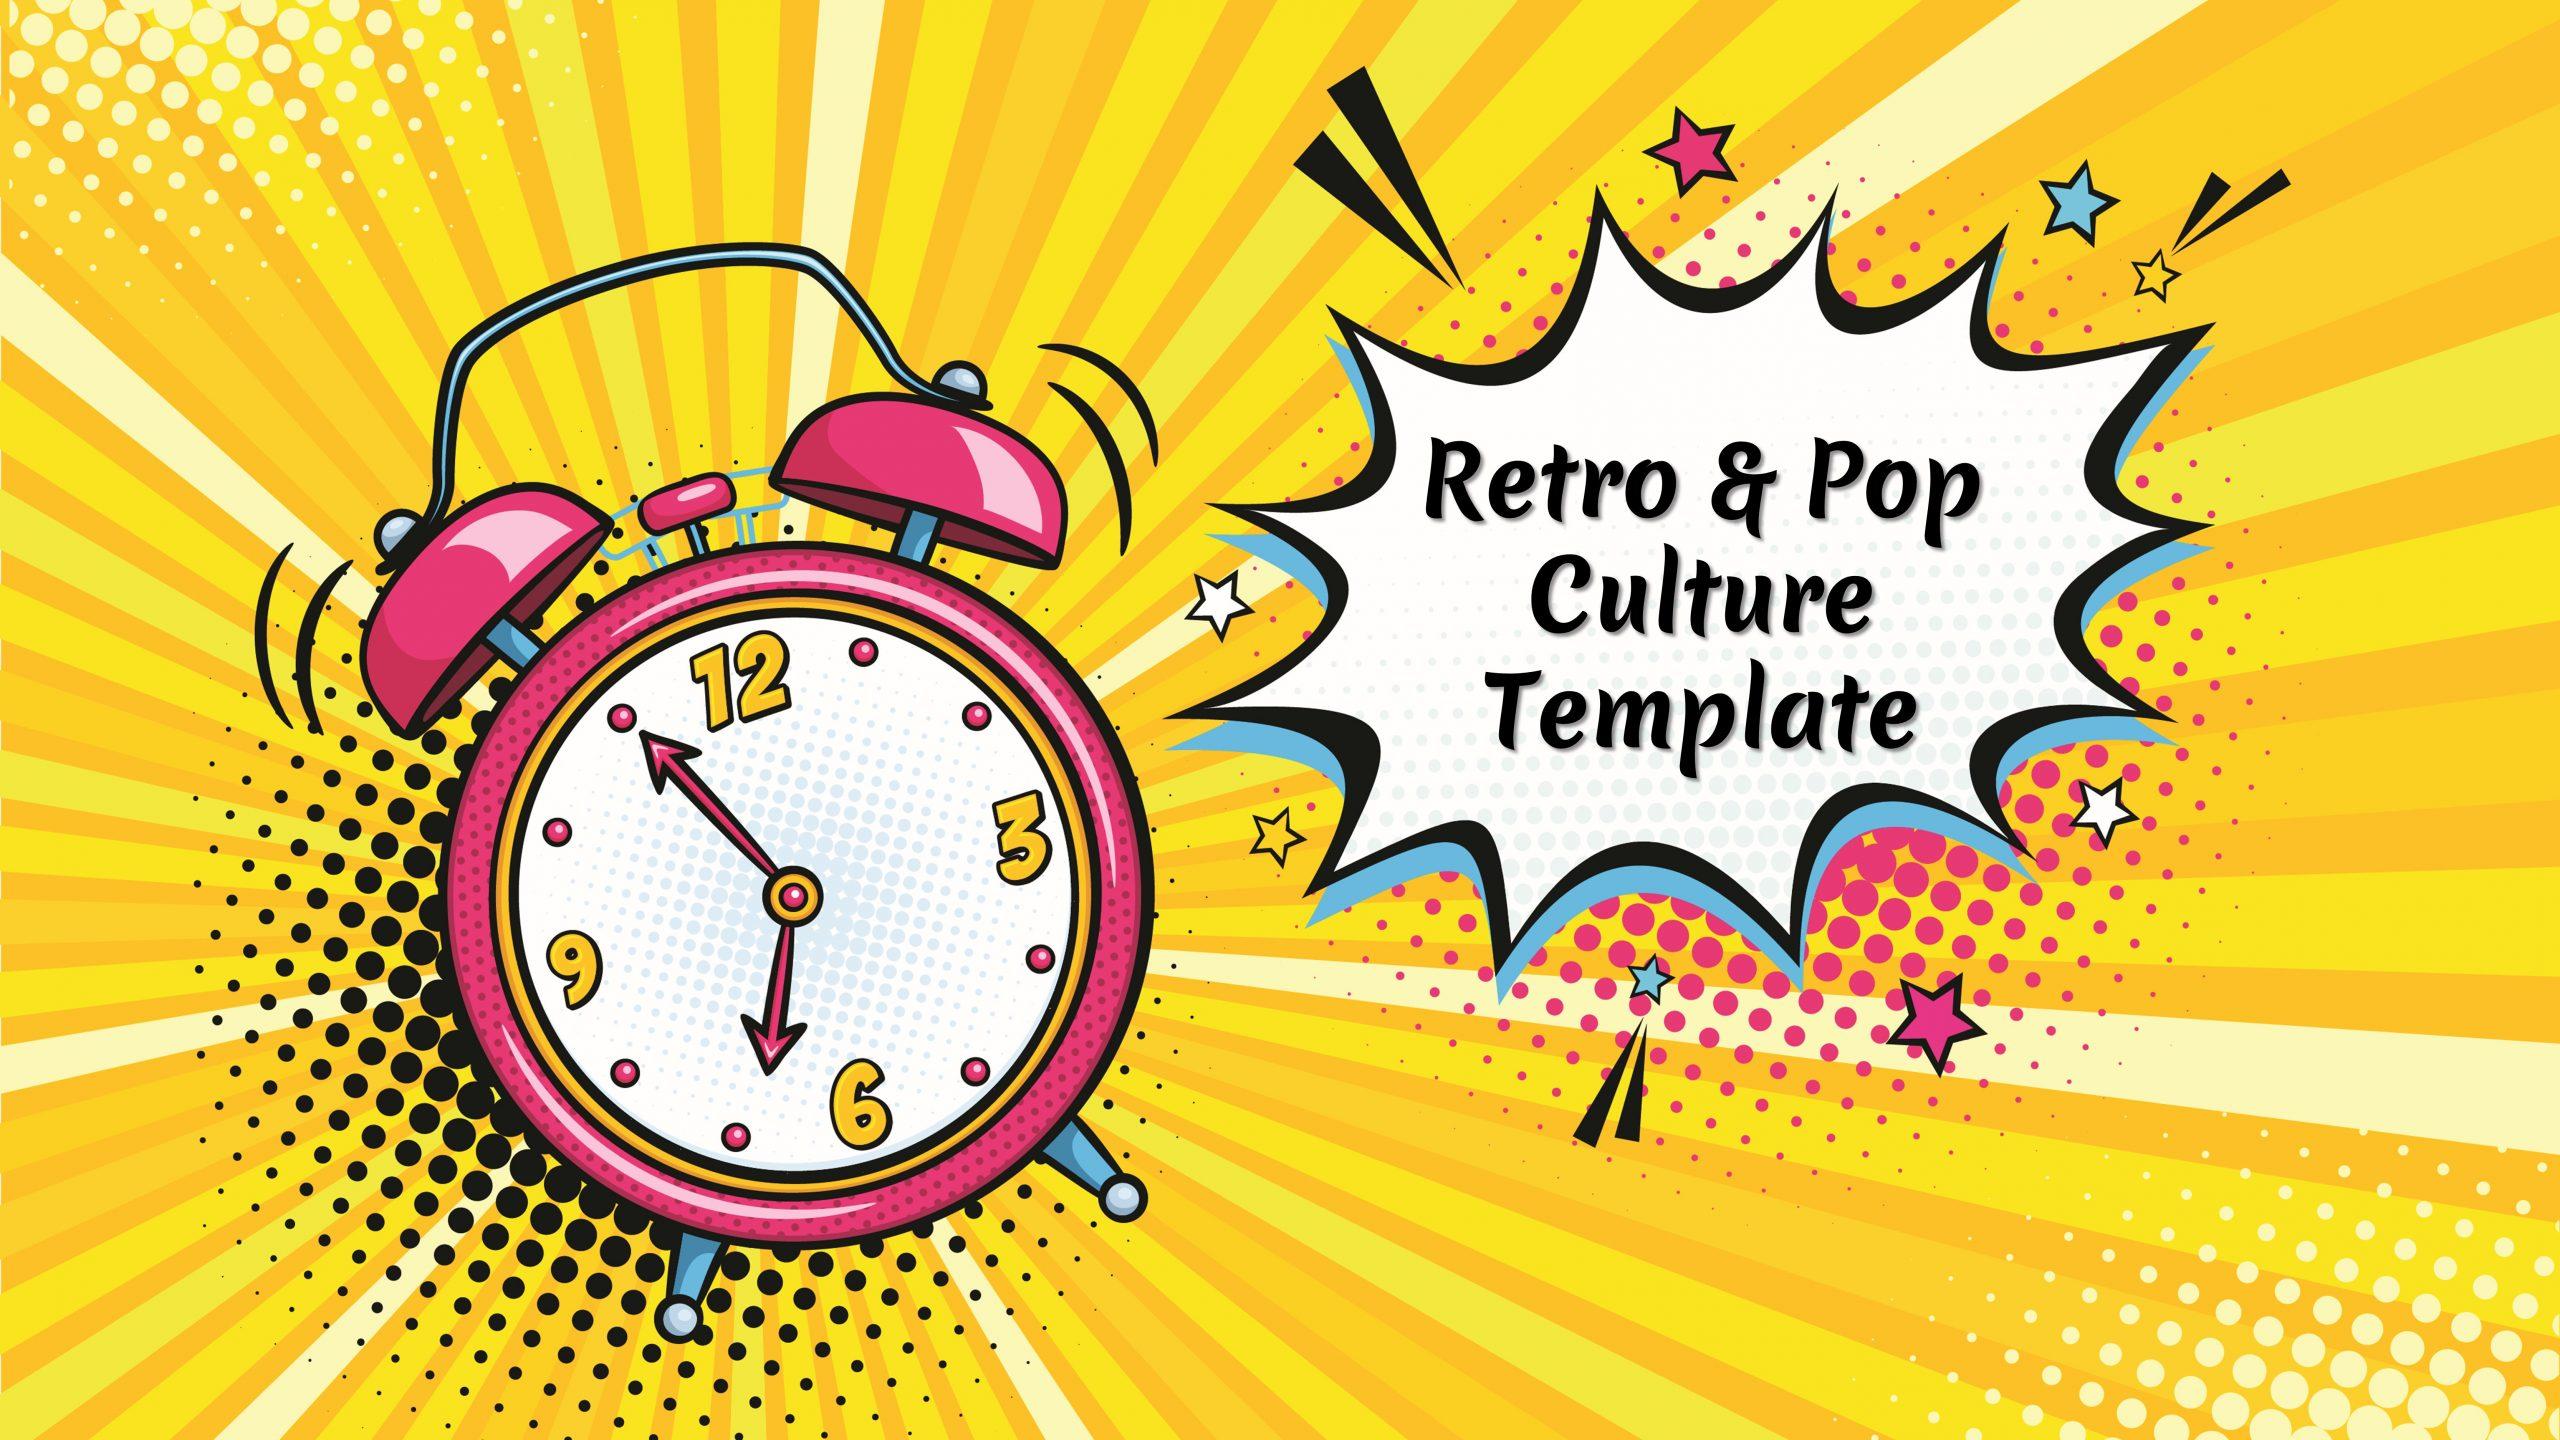 Free presentation template of Retro and Pop